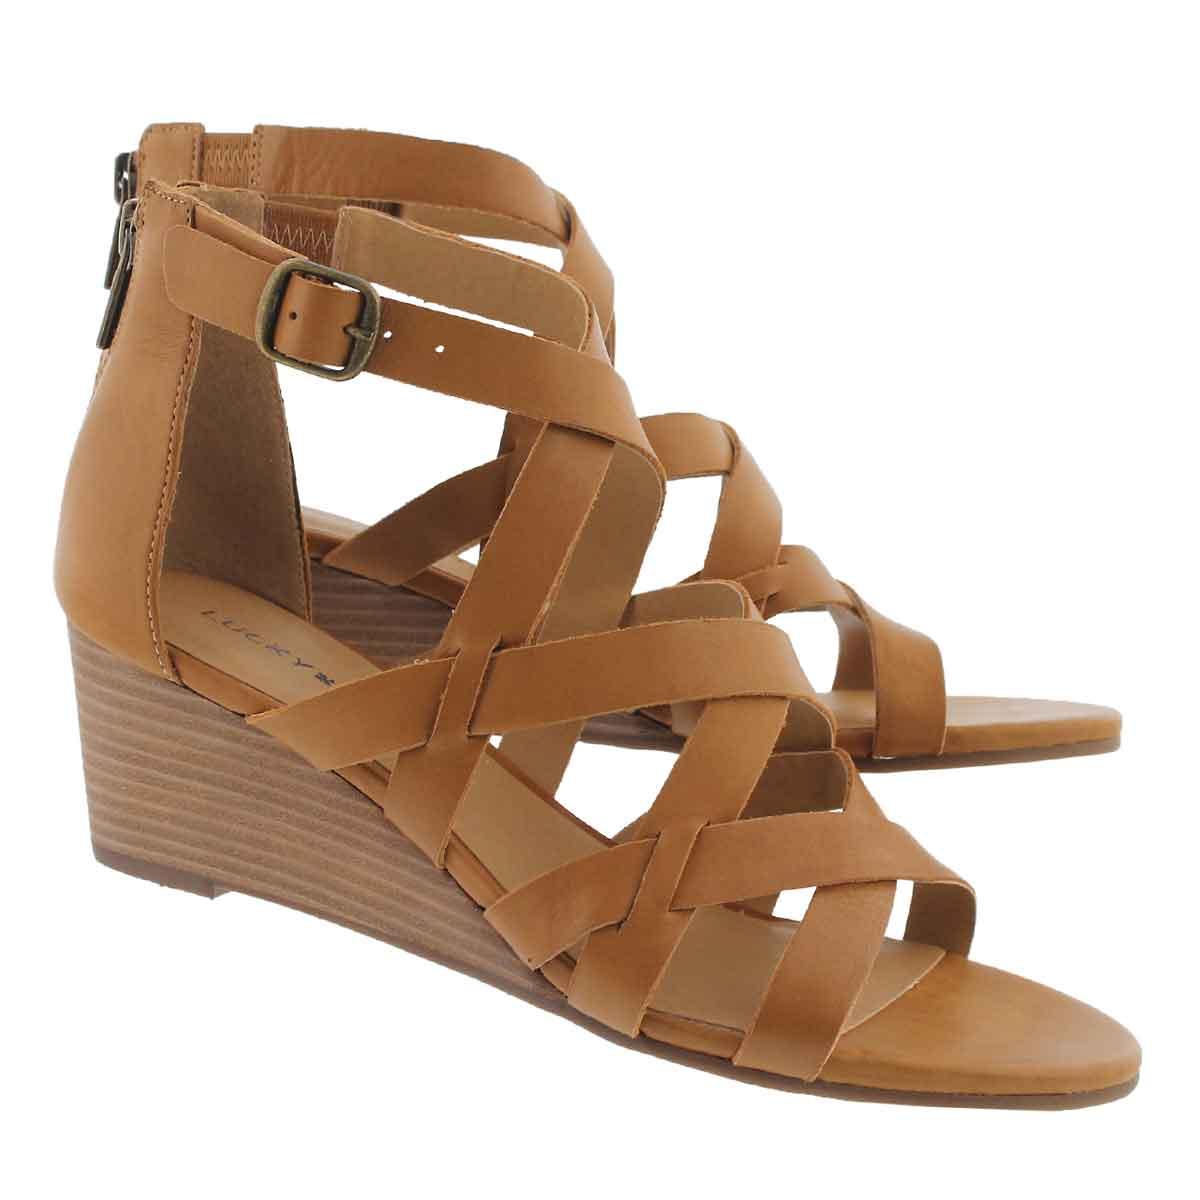 Lds Jewelia sandy wedge sandal